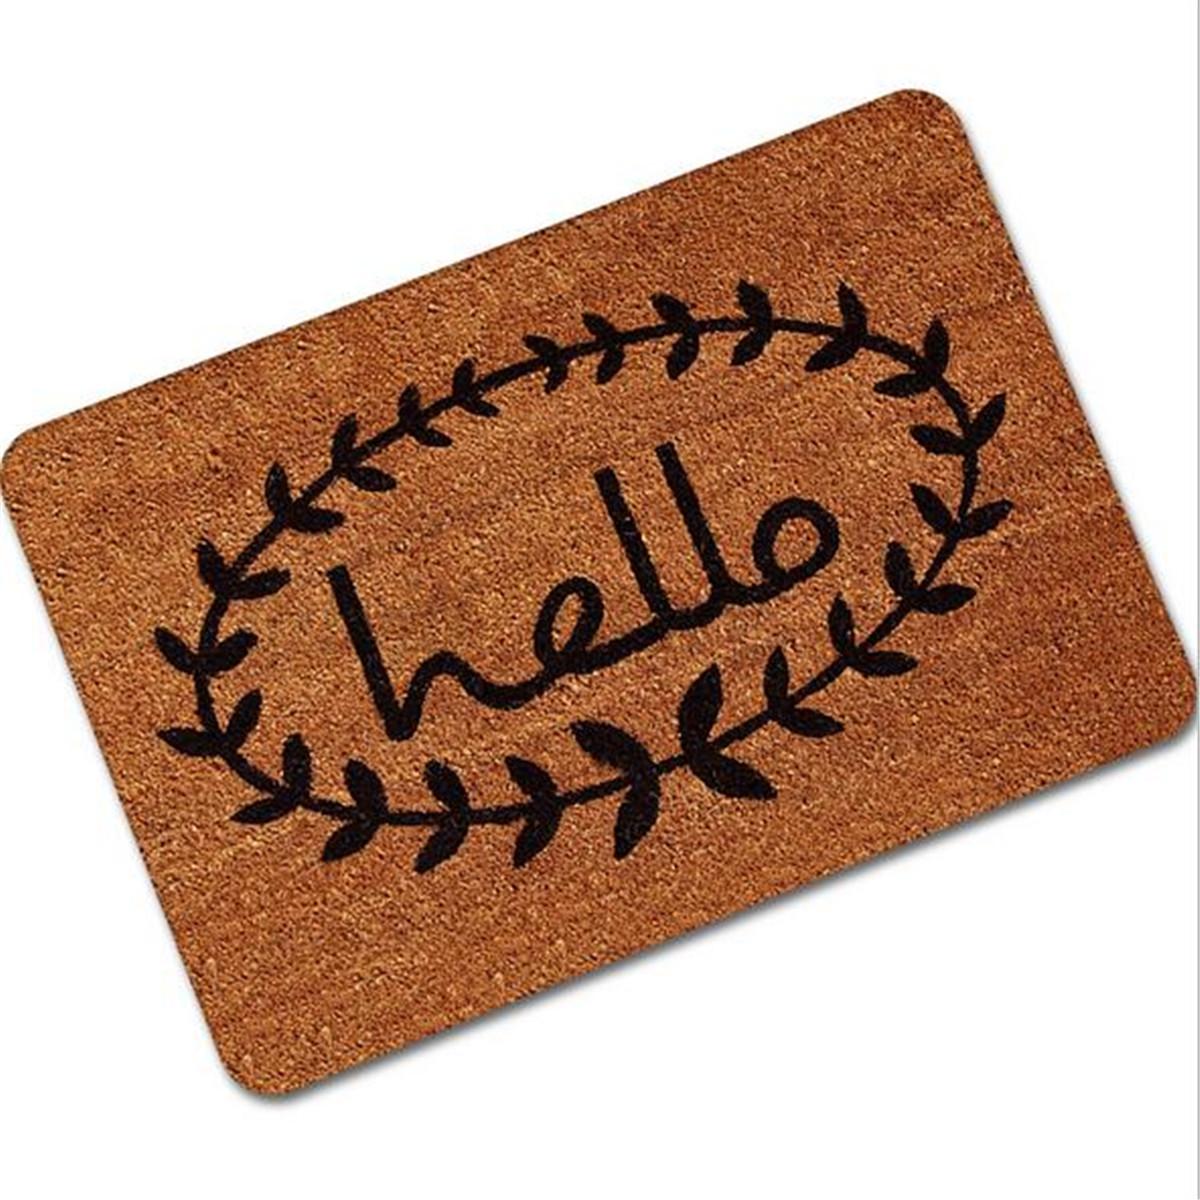 Letter Funny Welcome Home Entrance Floor Rug Non Slip